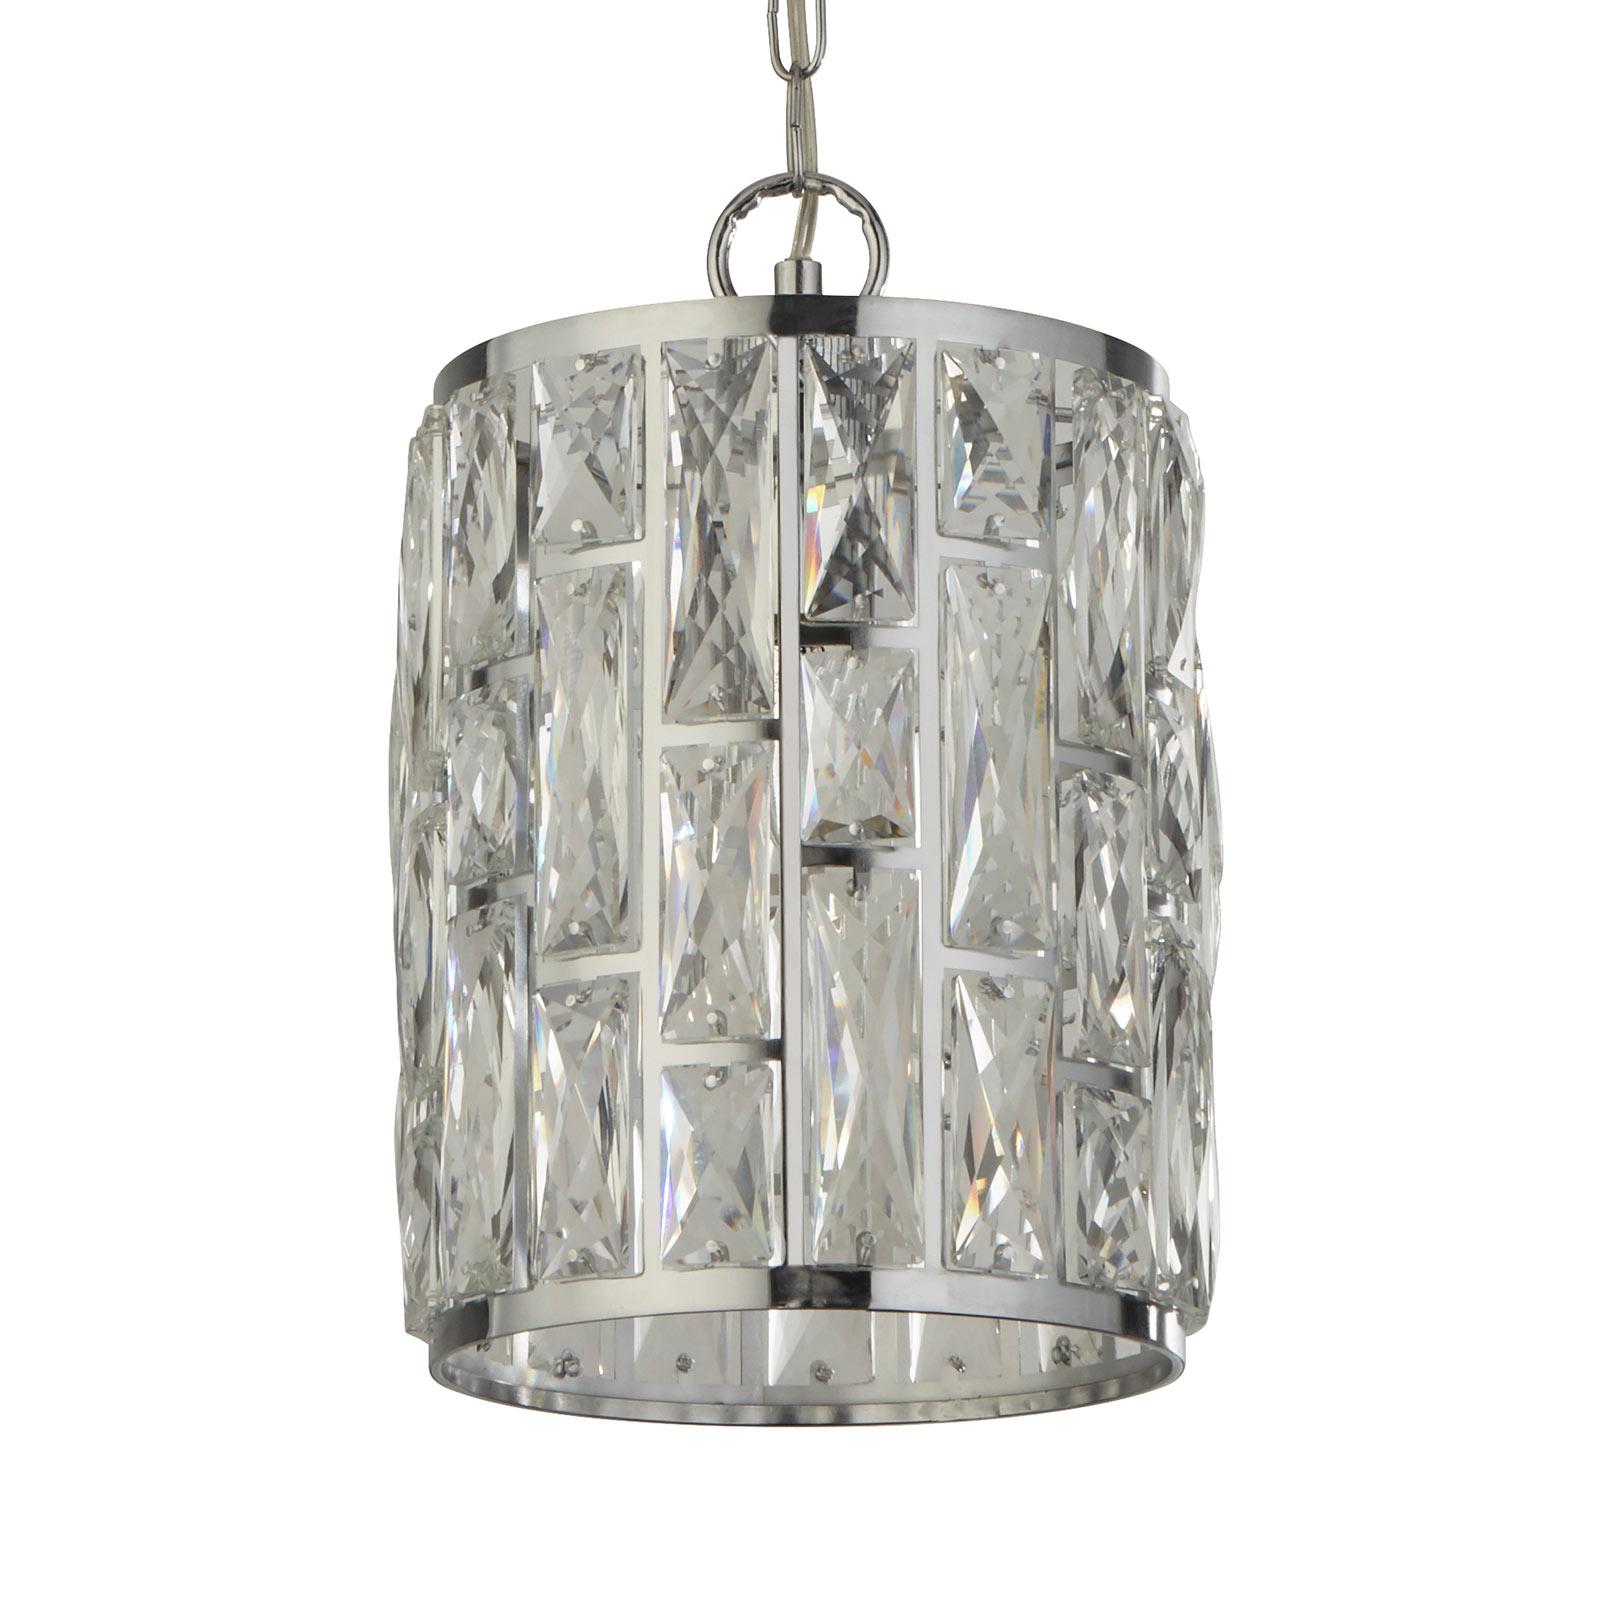 Sospensione Bijou, paralume cristalli, Ø 22 cm